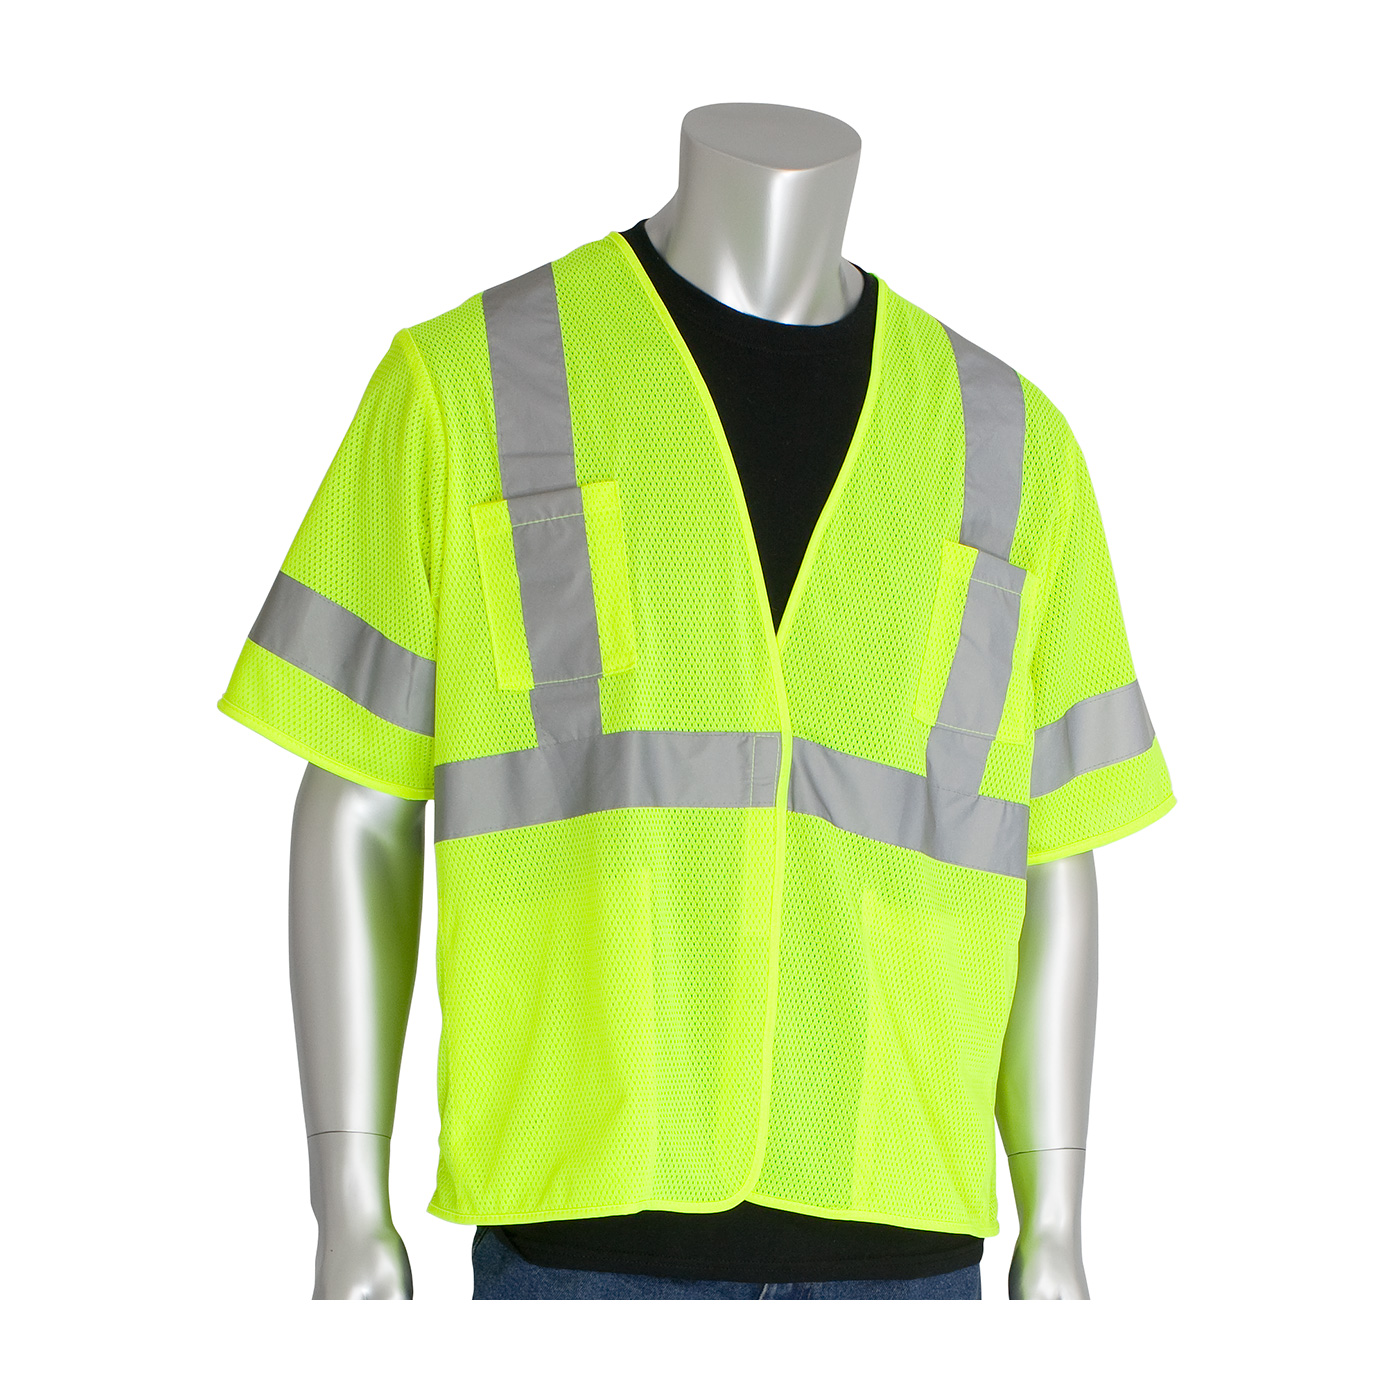 Ansi Type R Class 3 Value Four Pocket Mesh Reflective Vest